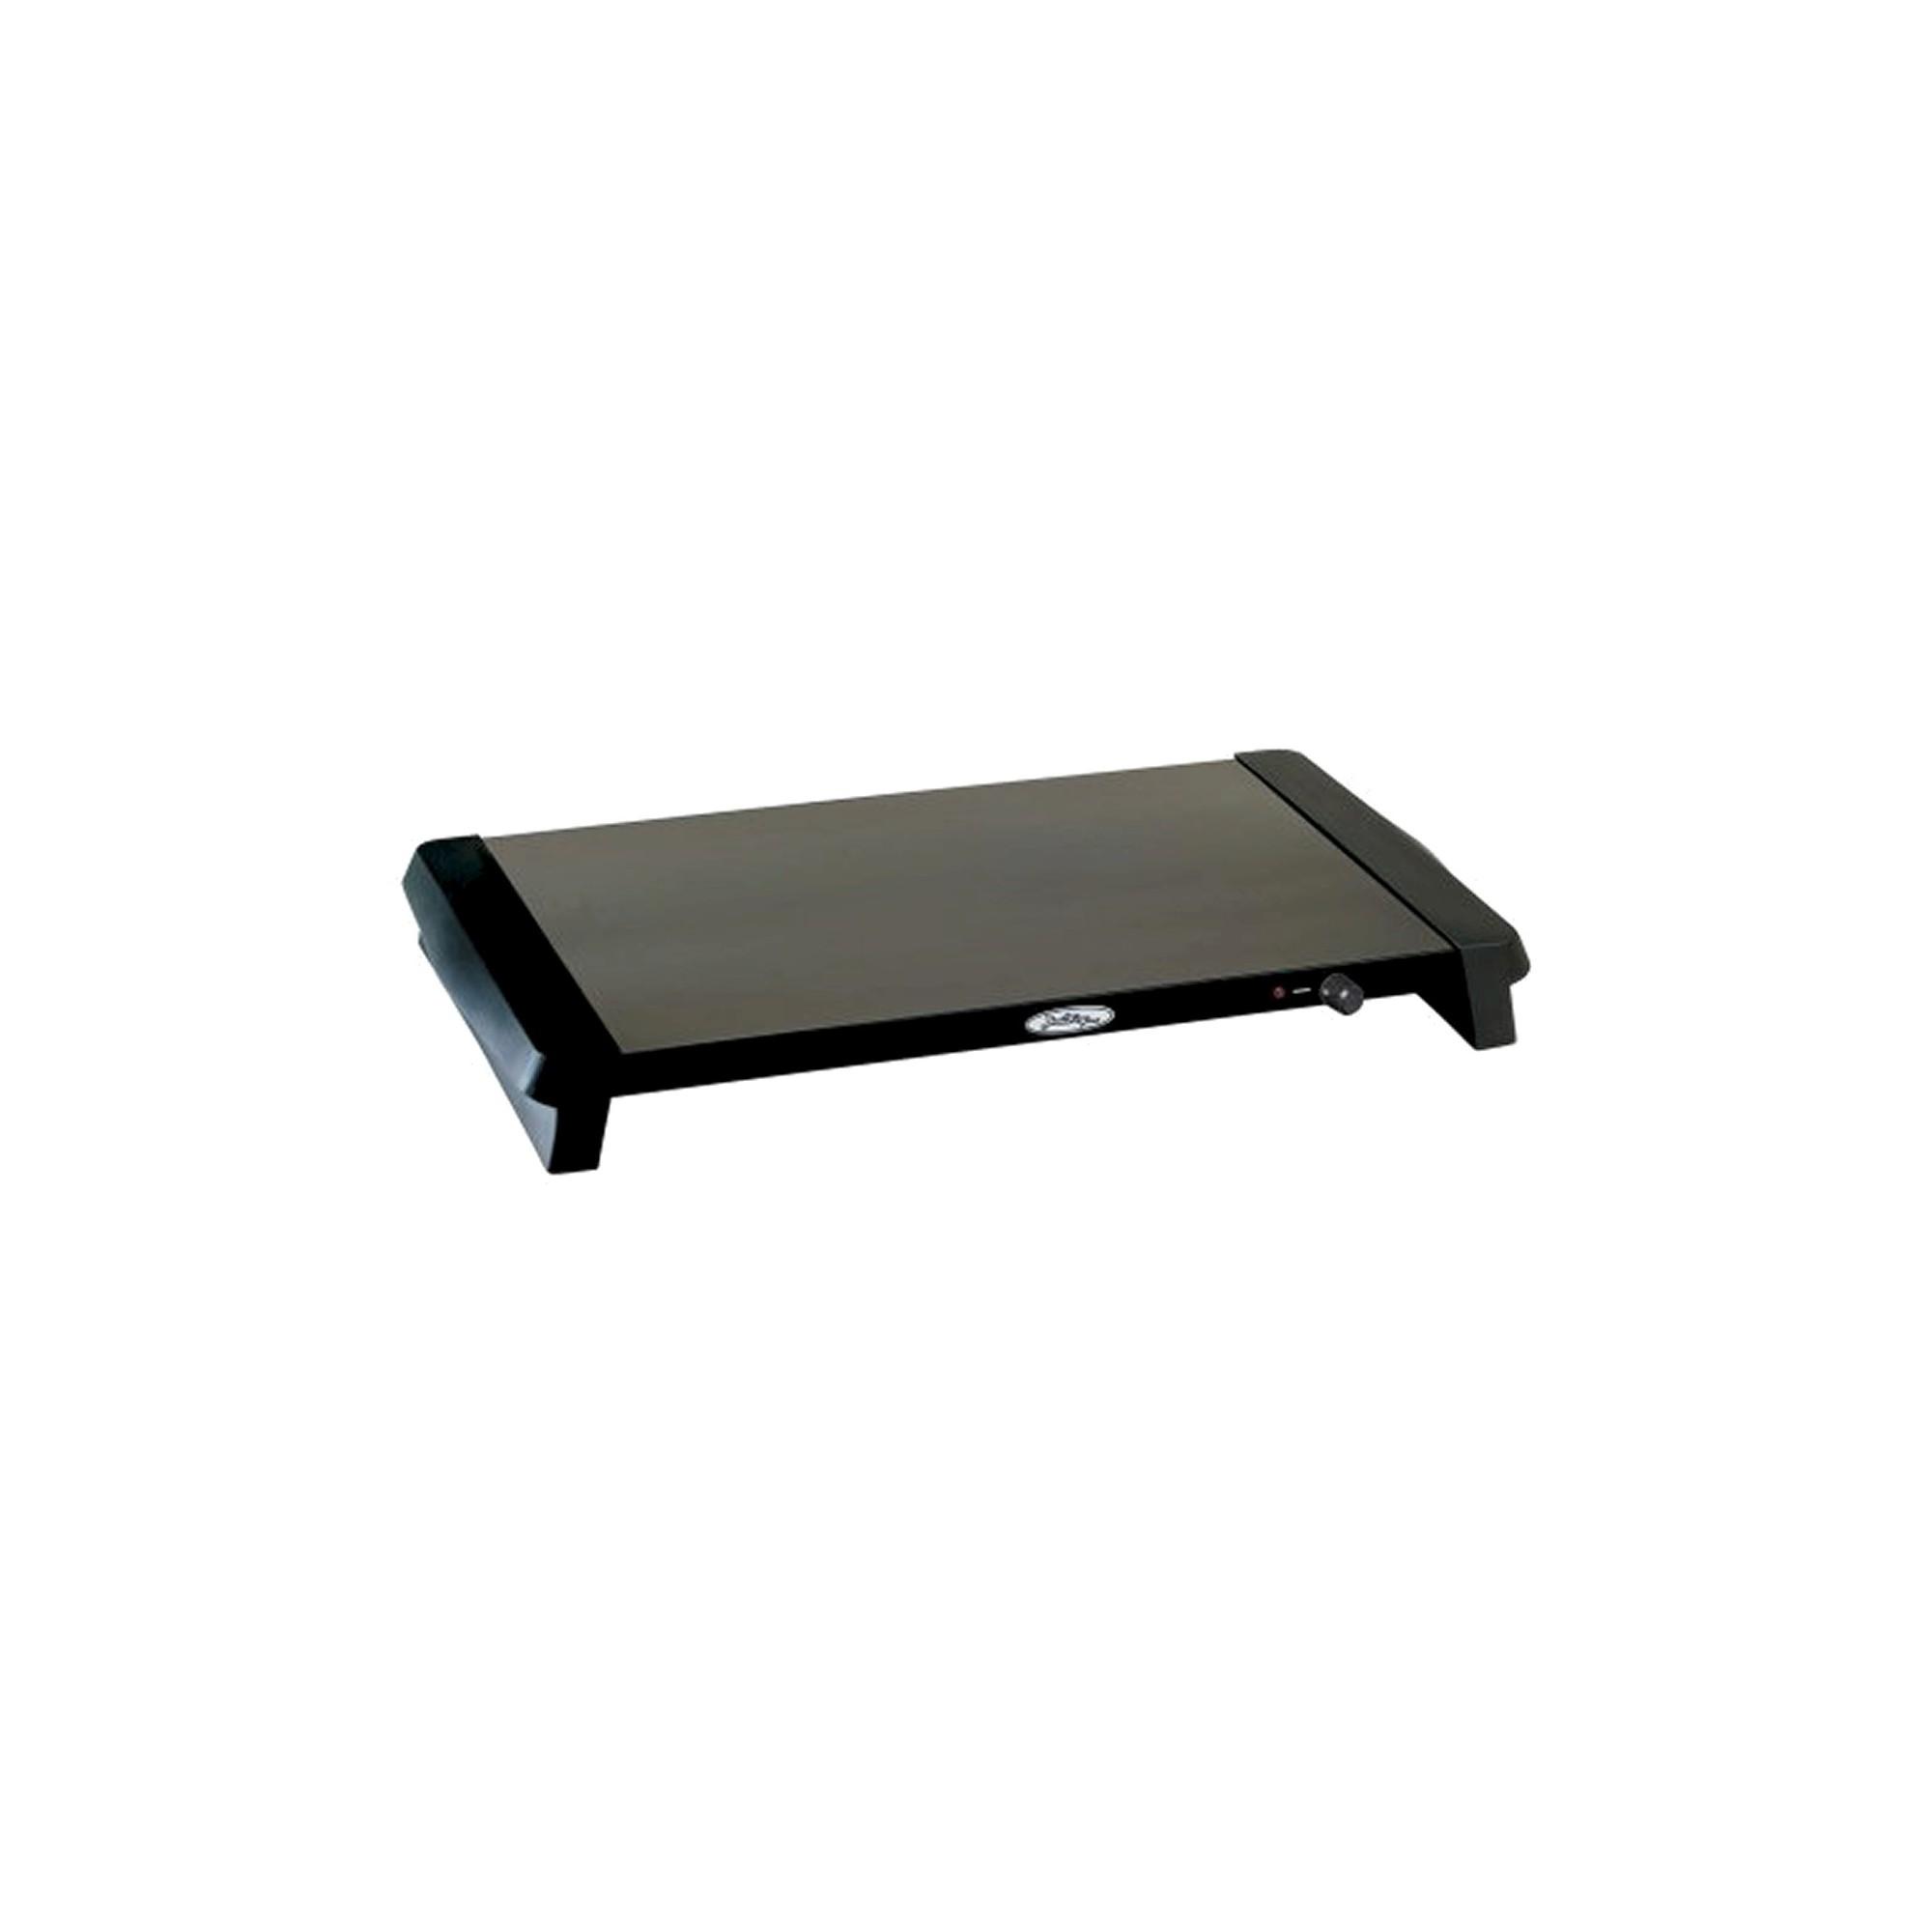 BroilKing Pro Warming Tray - Black